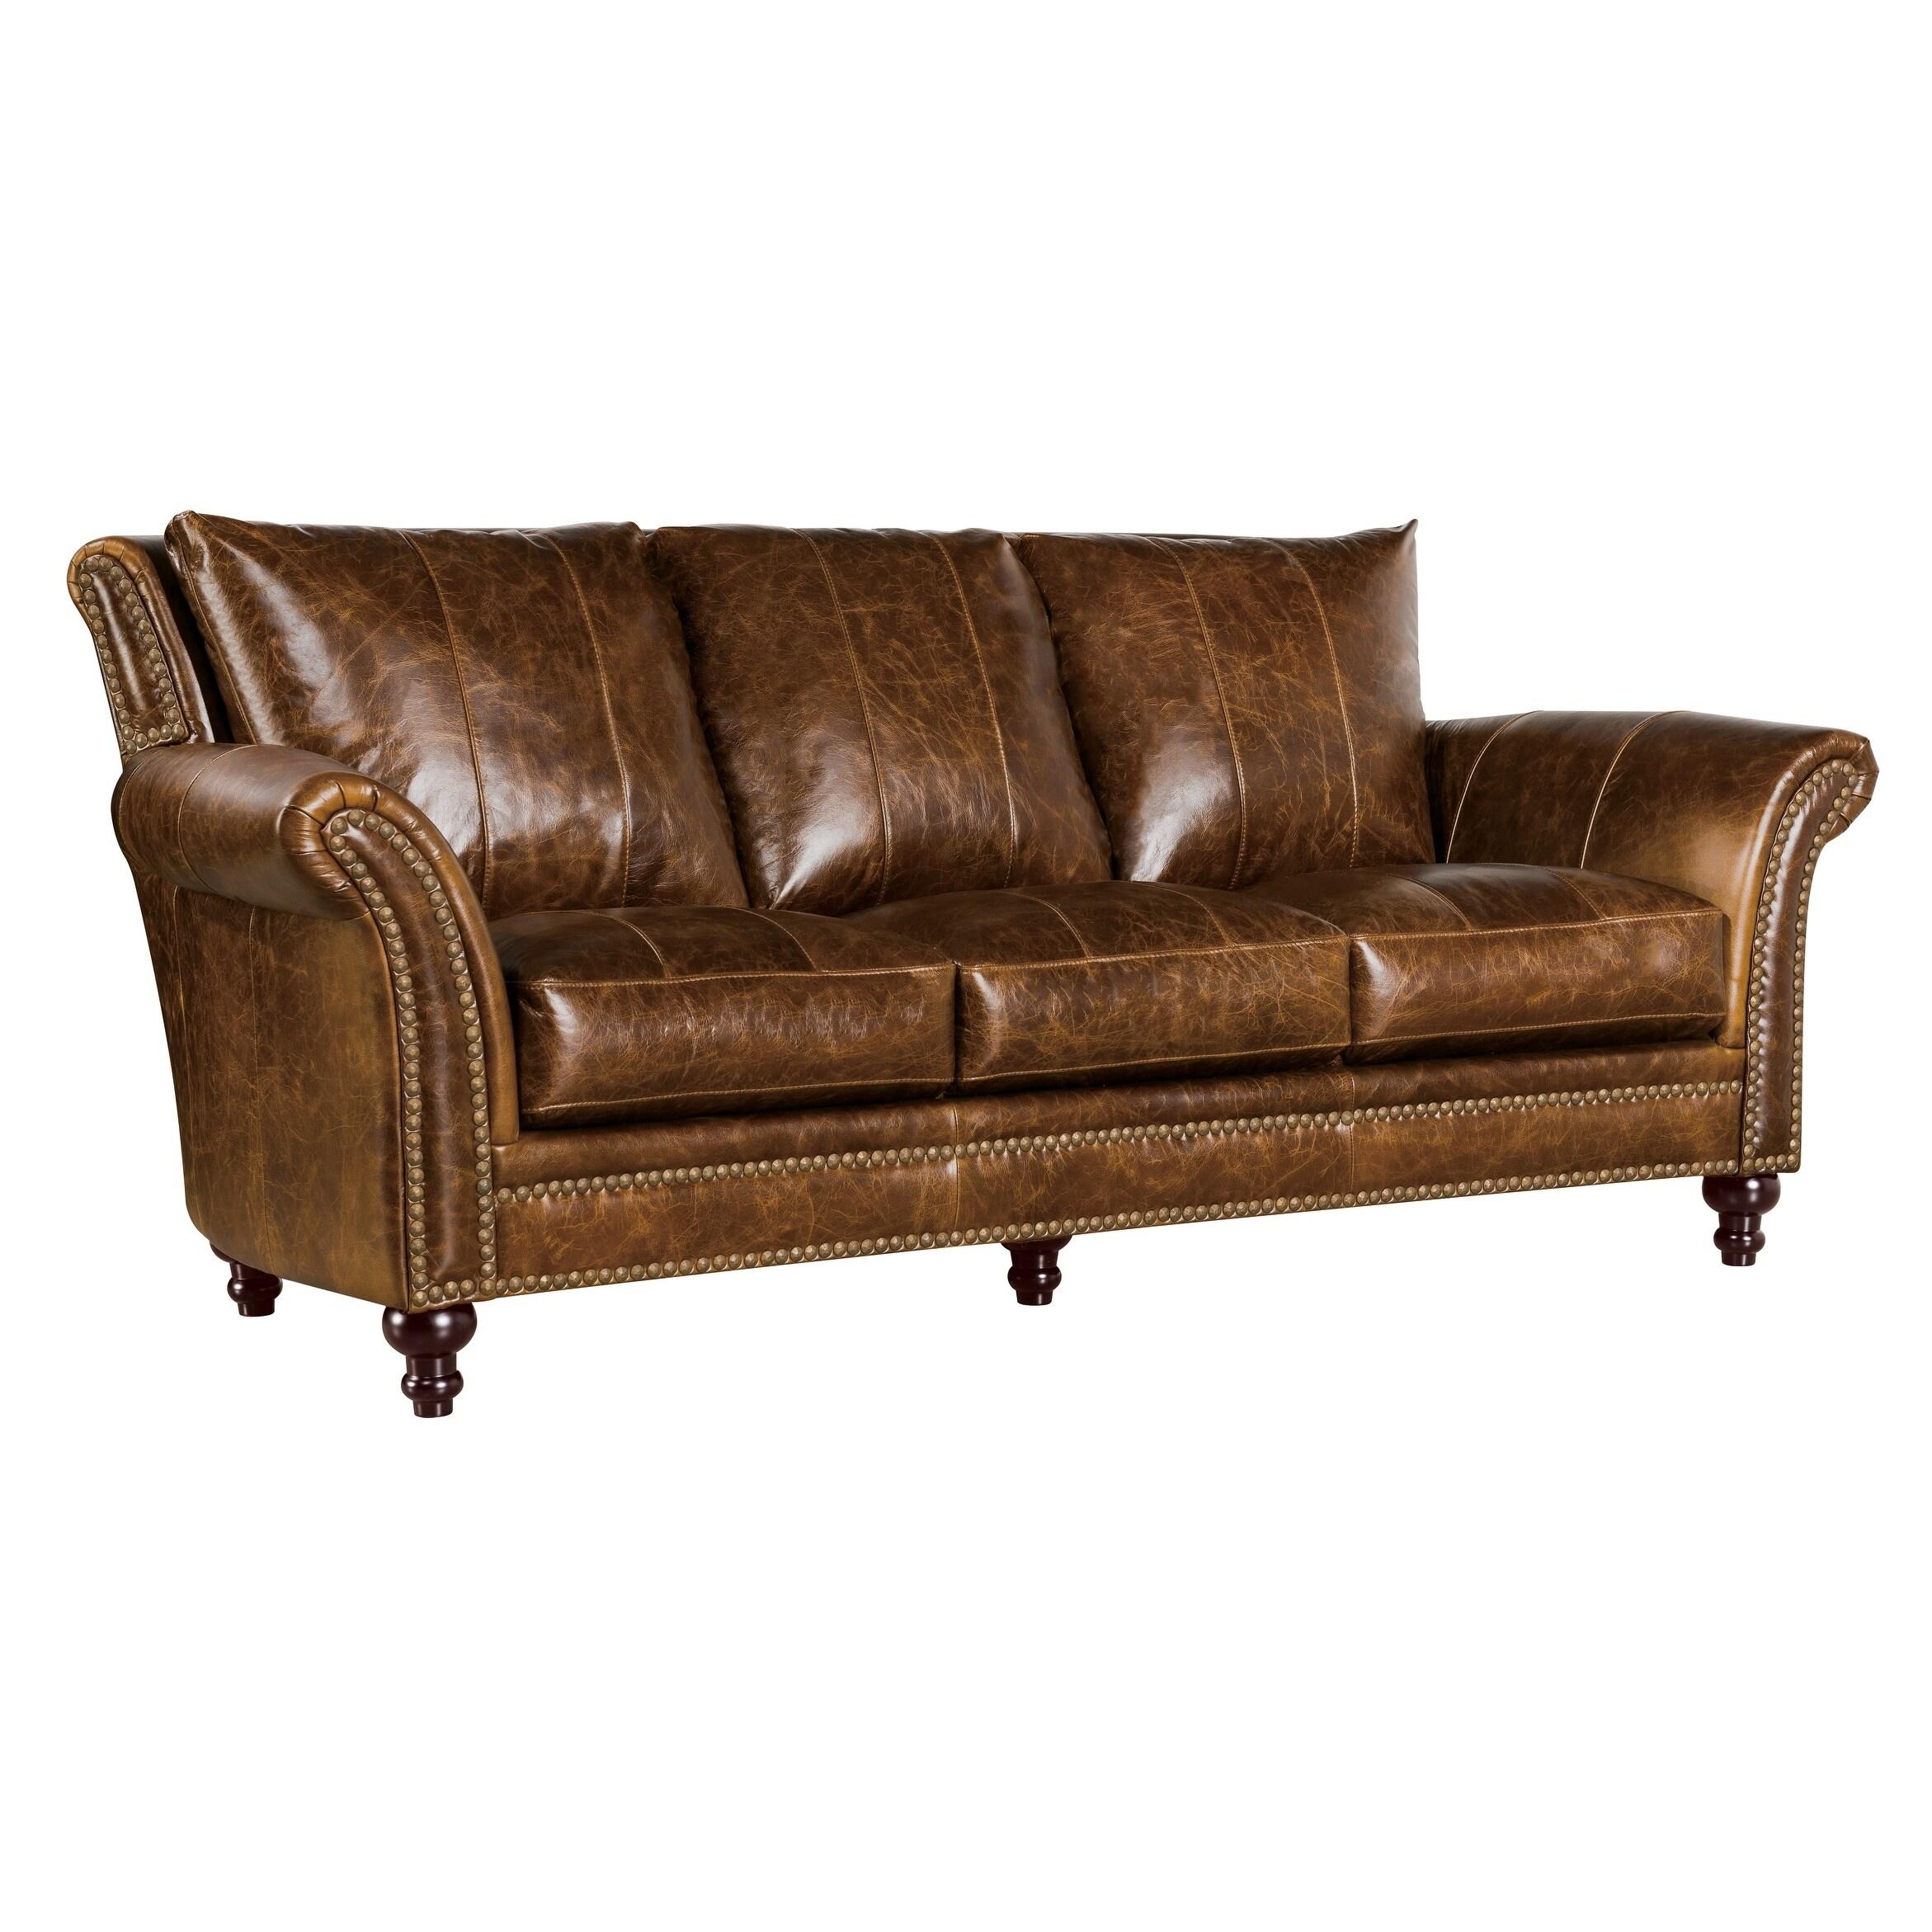 Shop Archibald 100% Top Grain Italian Leather Sofa - Free Shipping ...